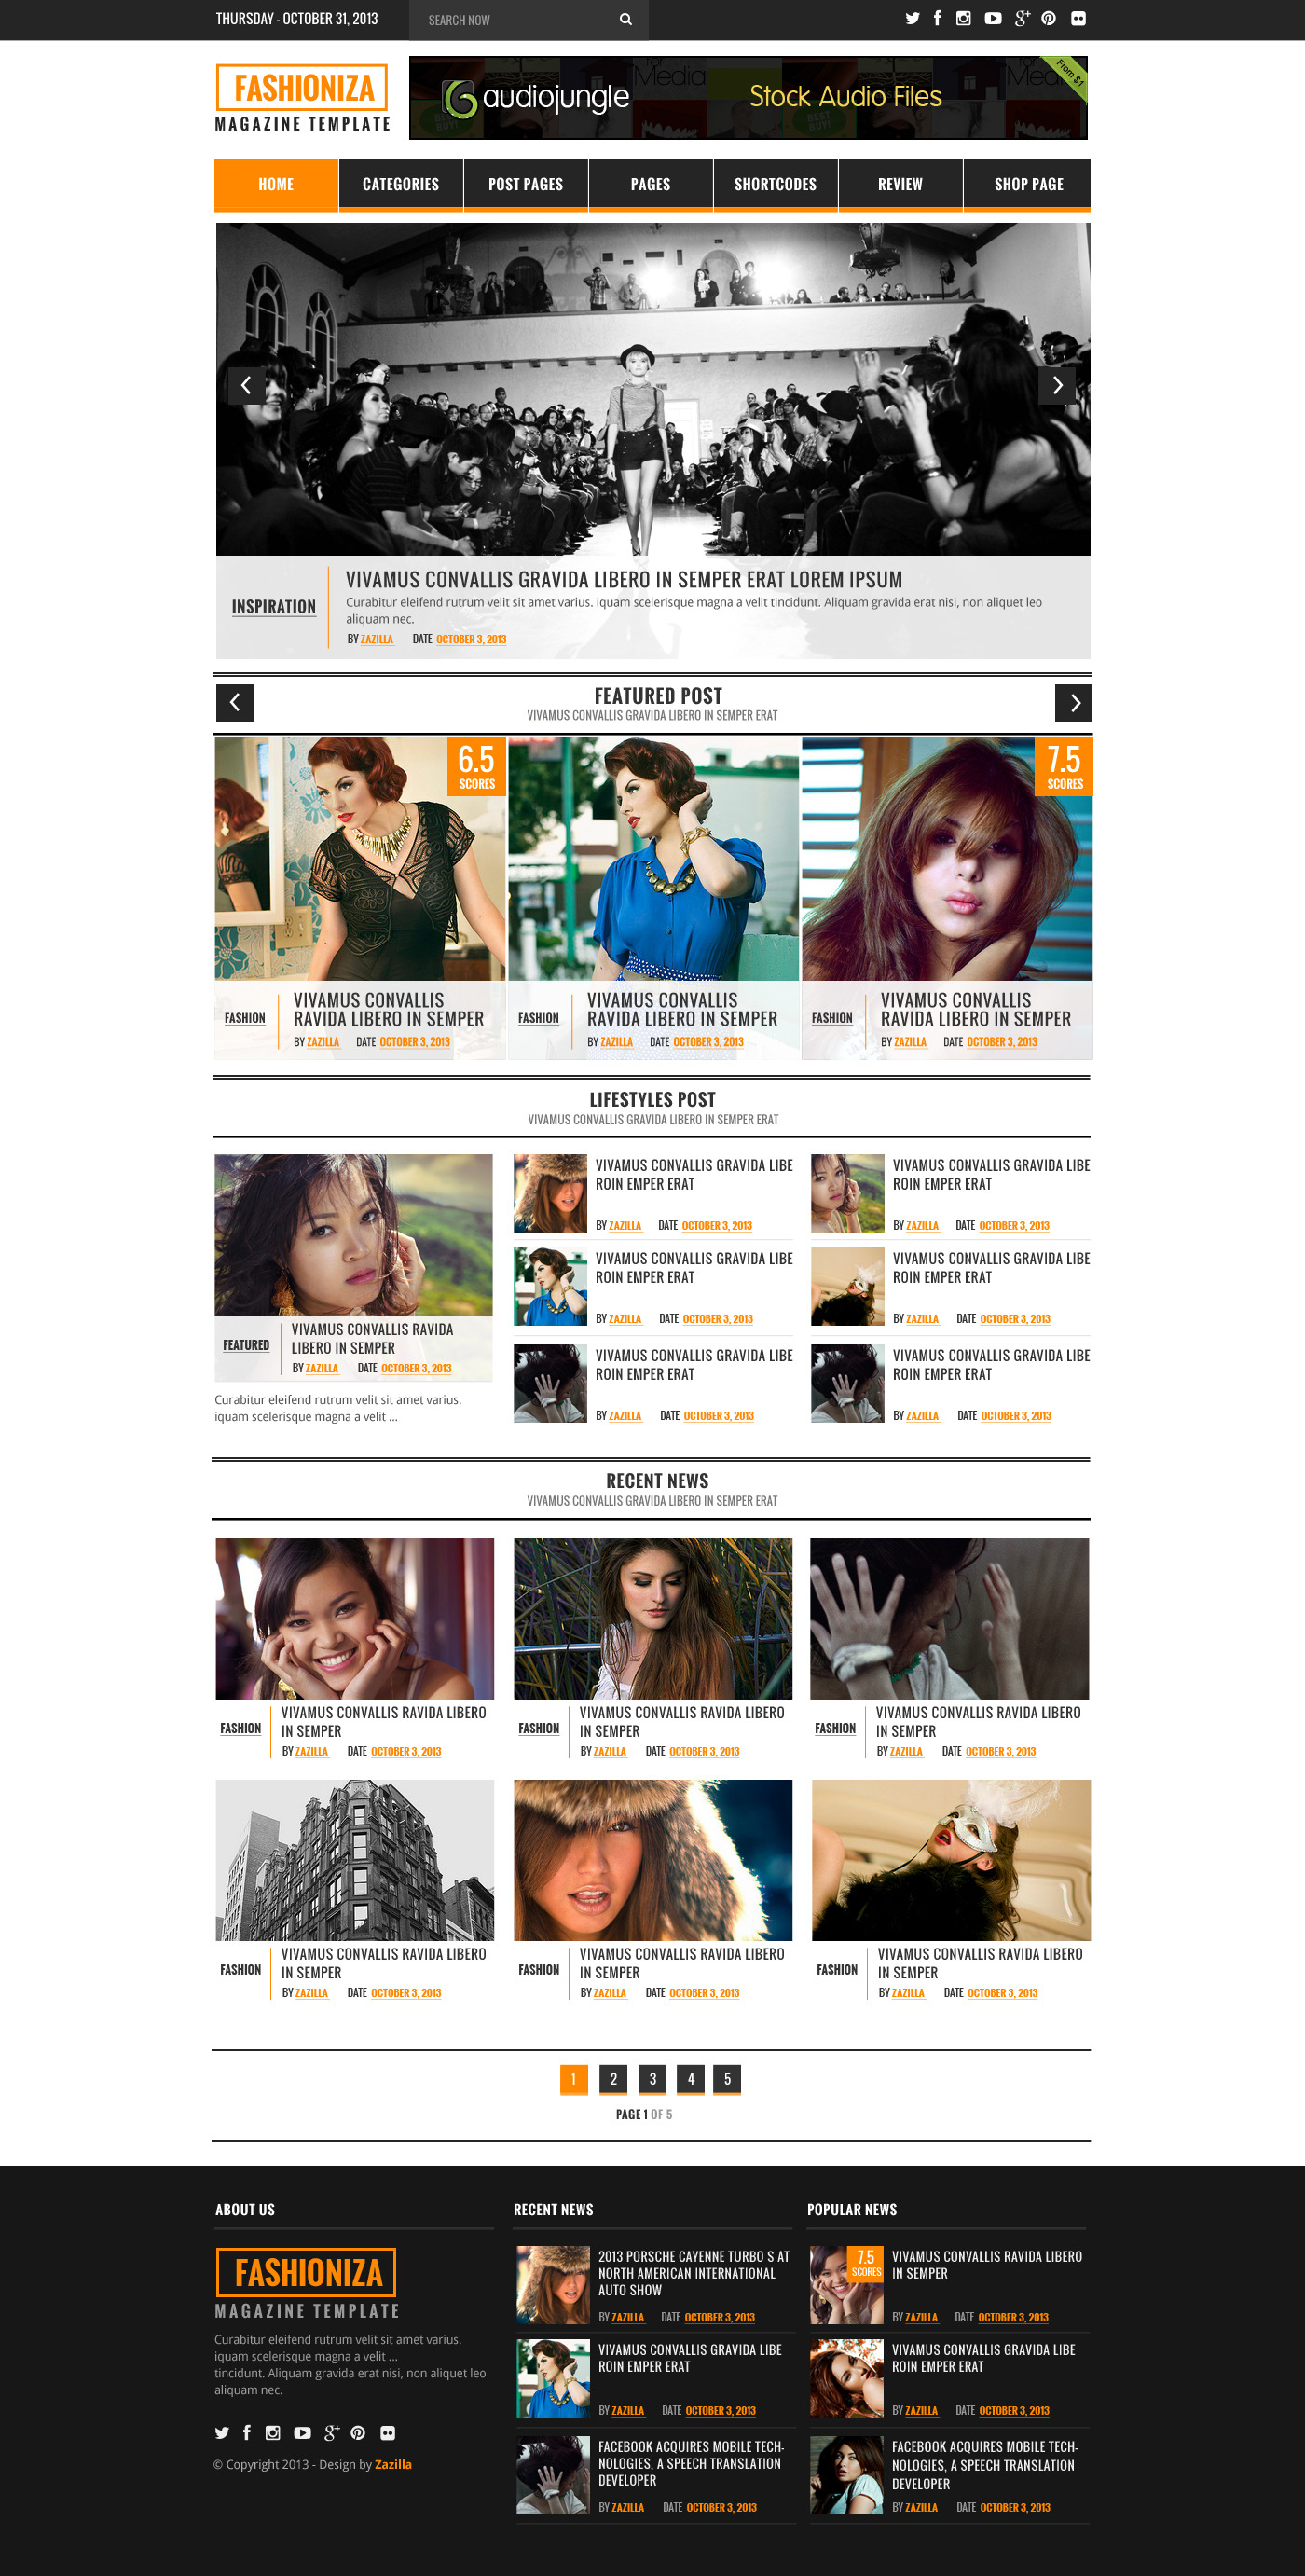 Fashioniza - Ultimate Fashion Magazine PSD